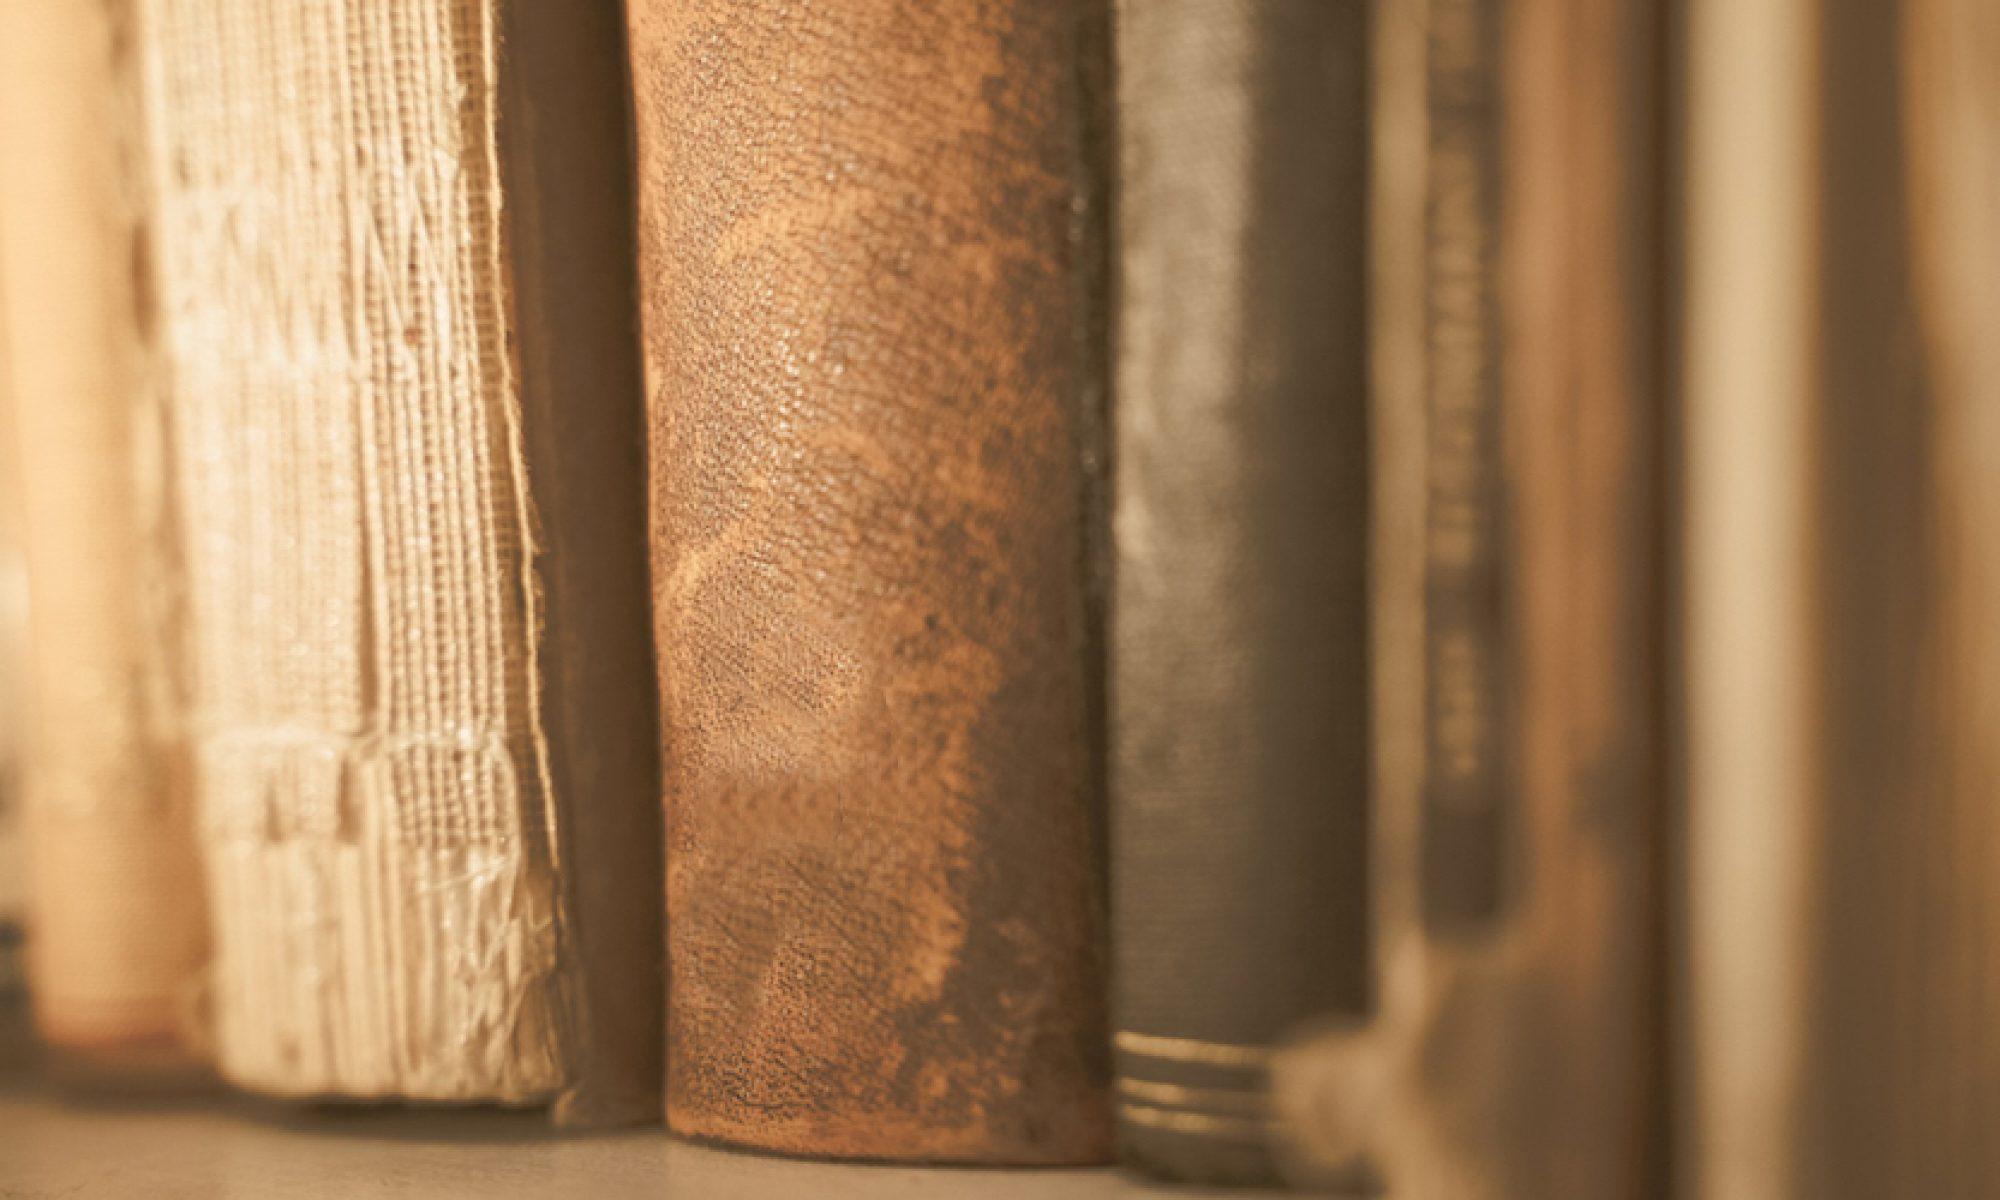 Rare Book and Digital Humanities